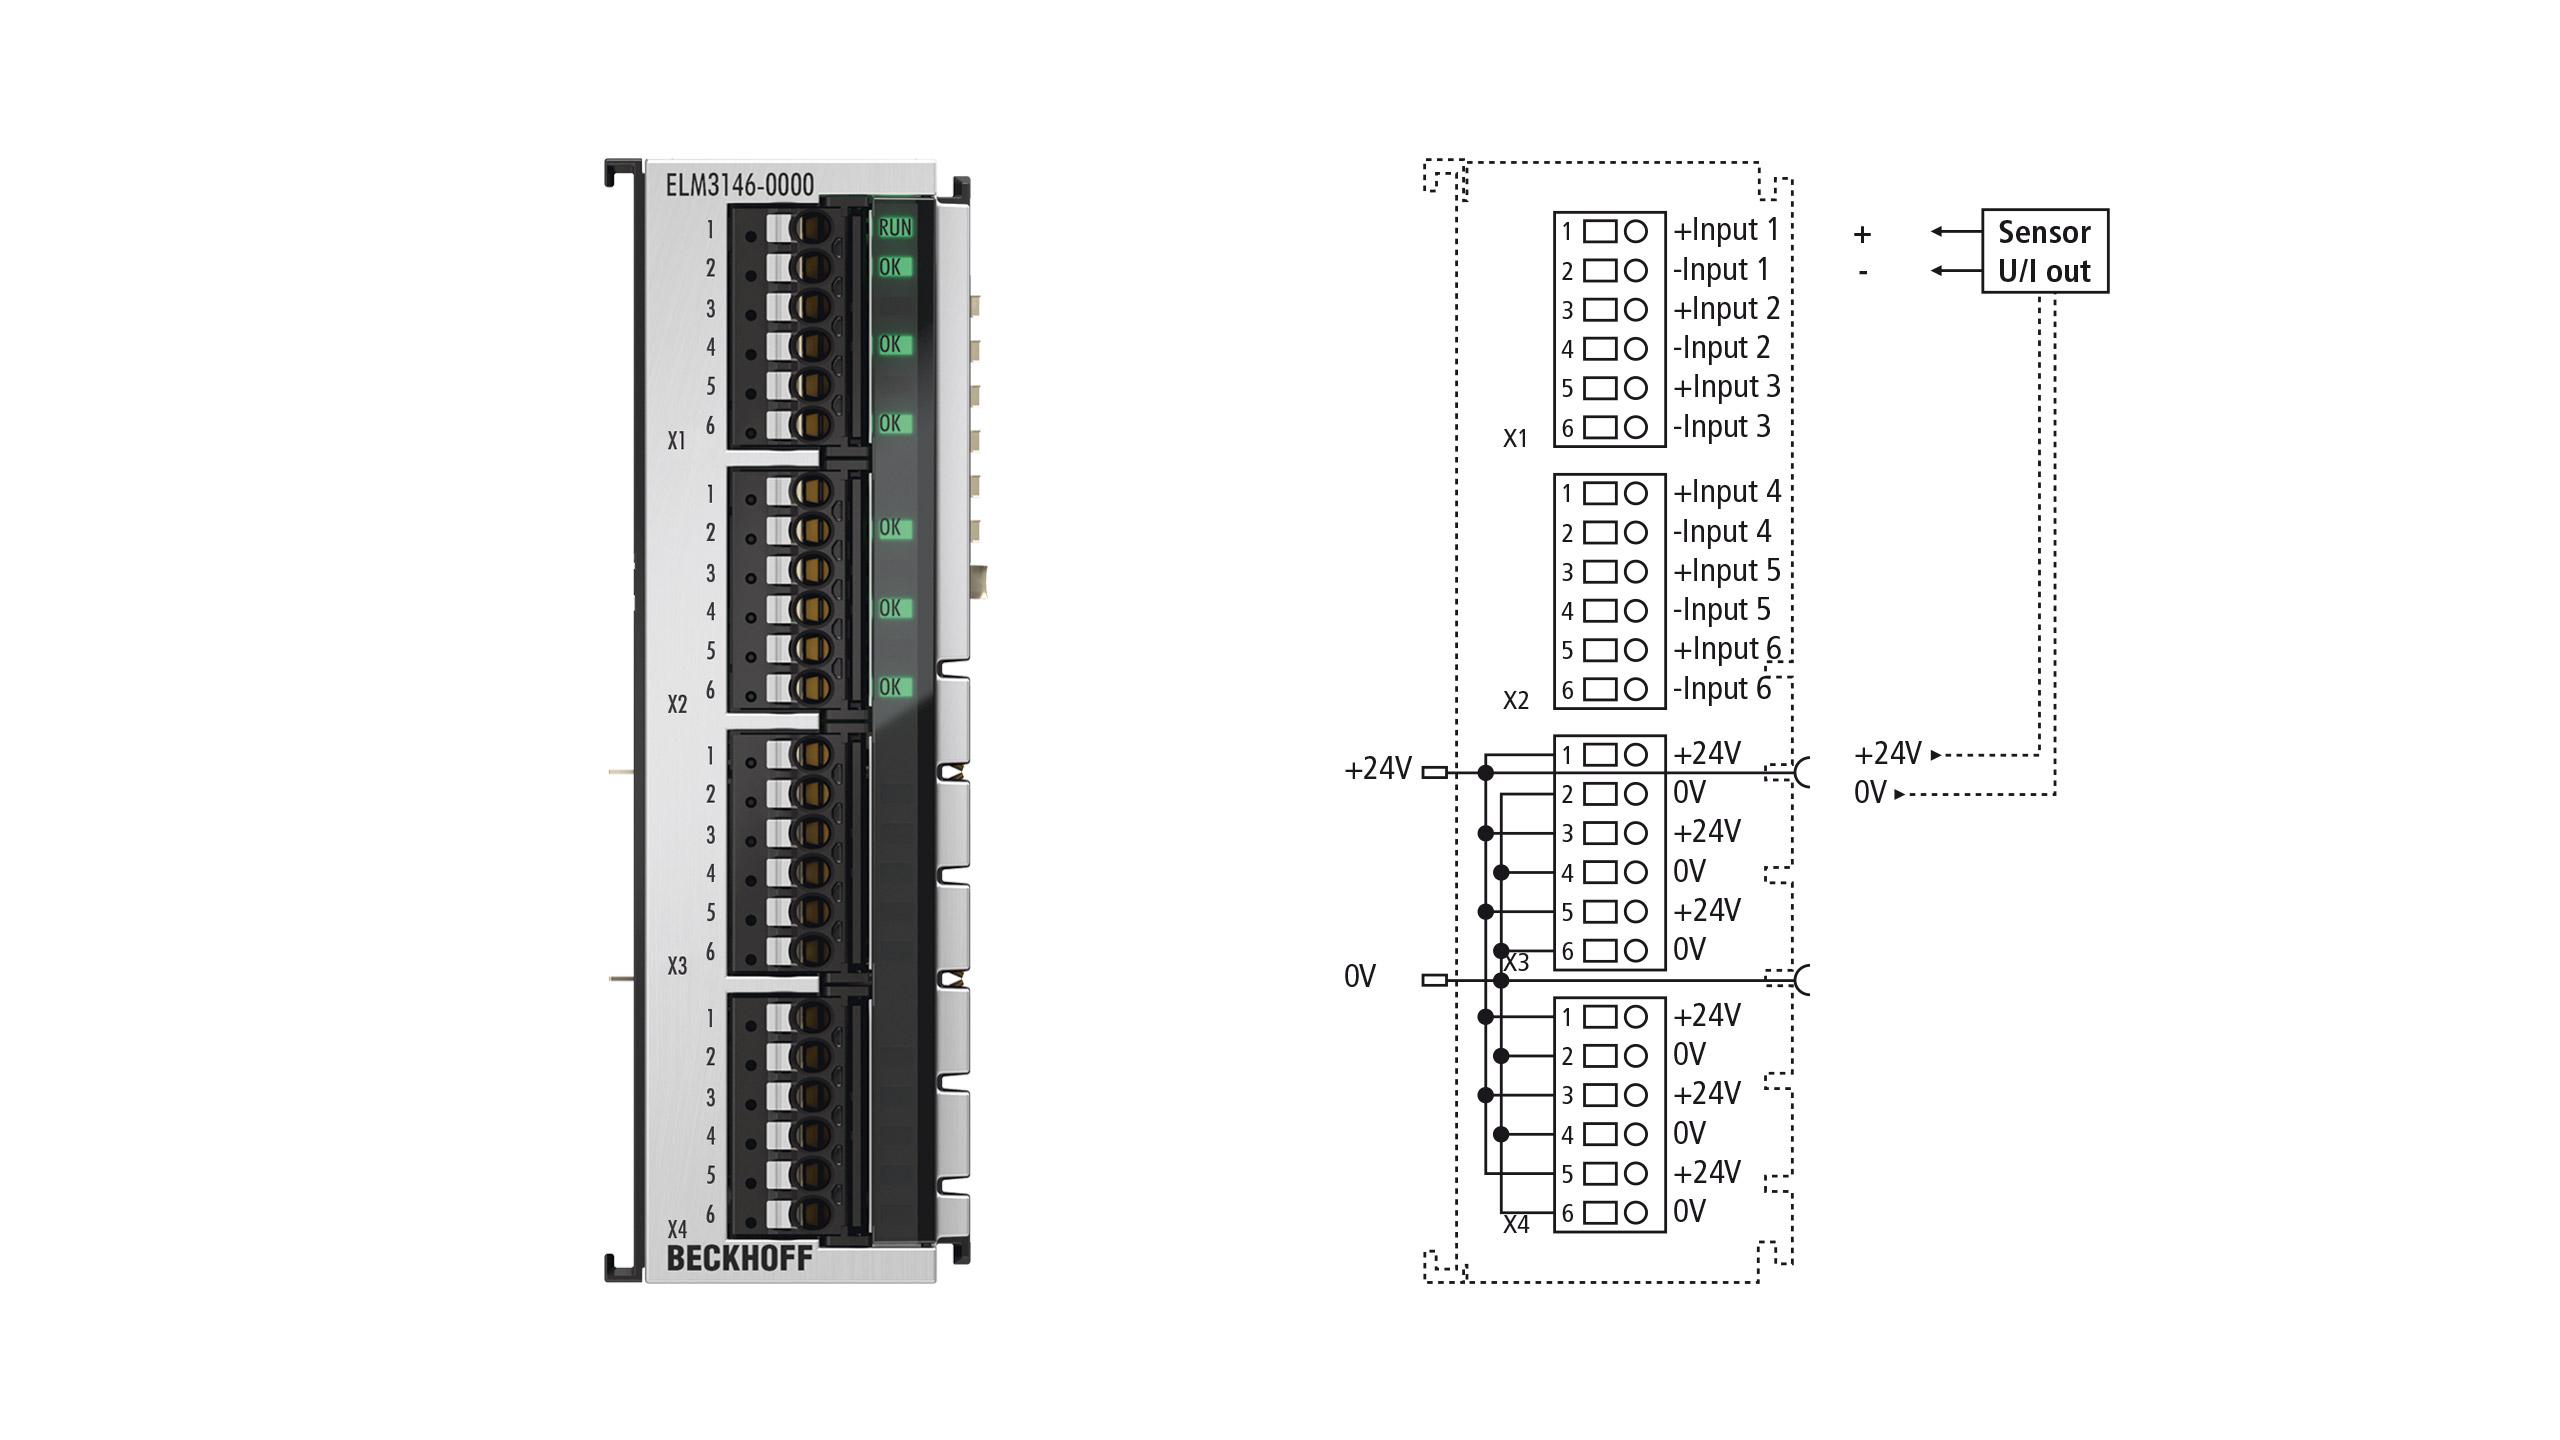 ELM3146-0000 | EtherCAT Terminal, 3-channel analog input, multi-function, ±10…±1.25V, ±20mA, 24bit, 1ksps